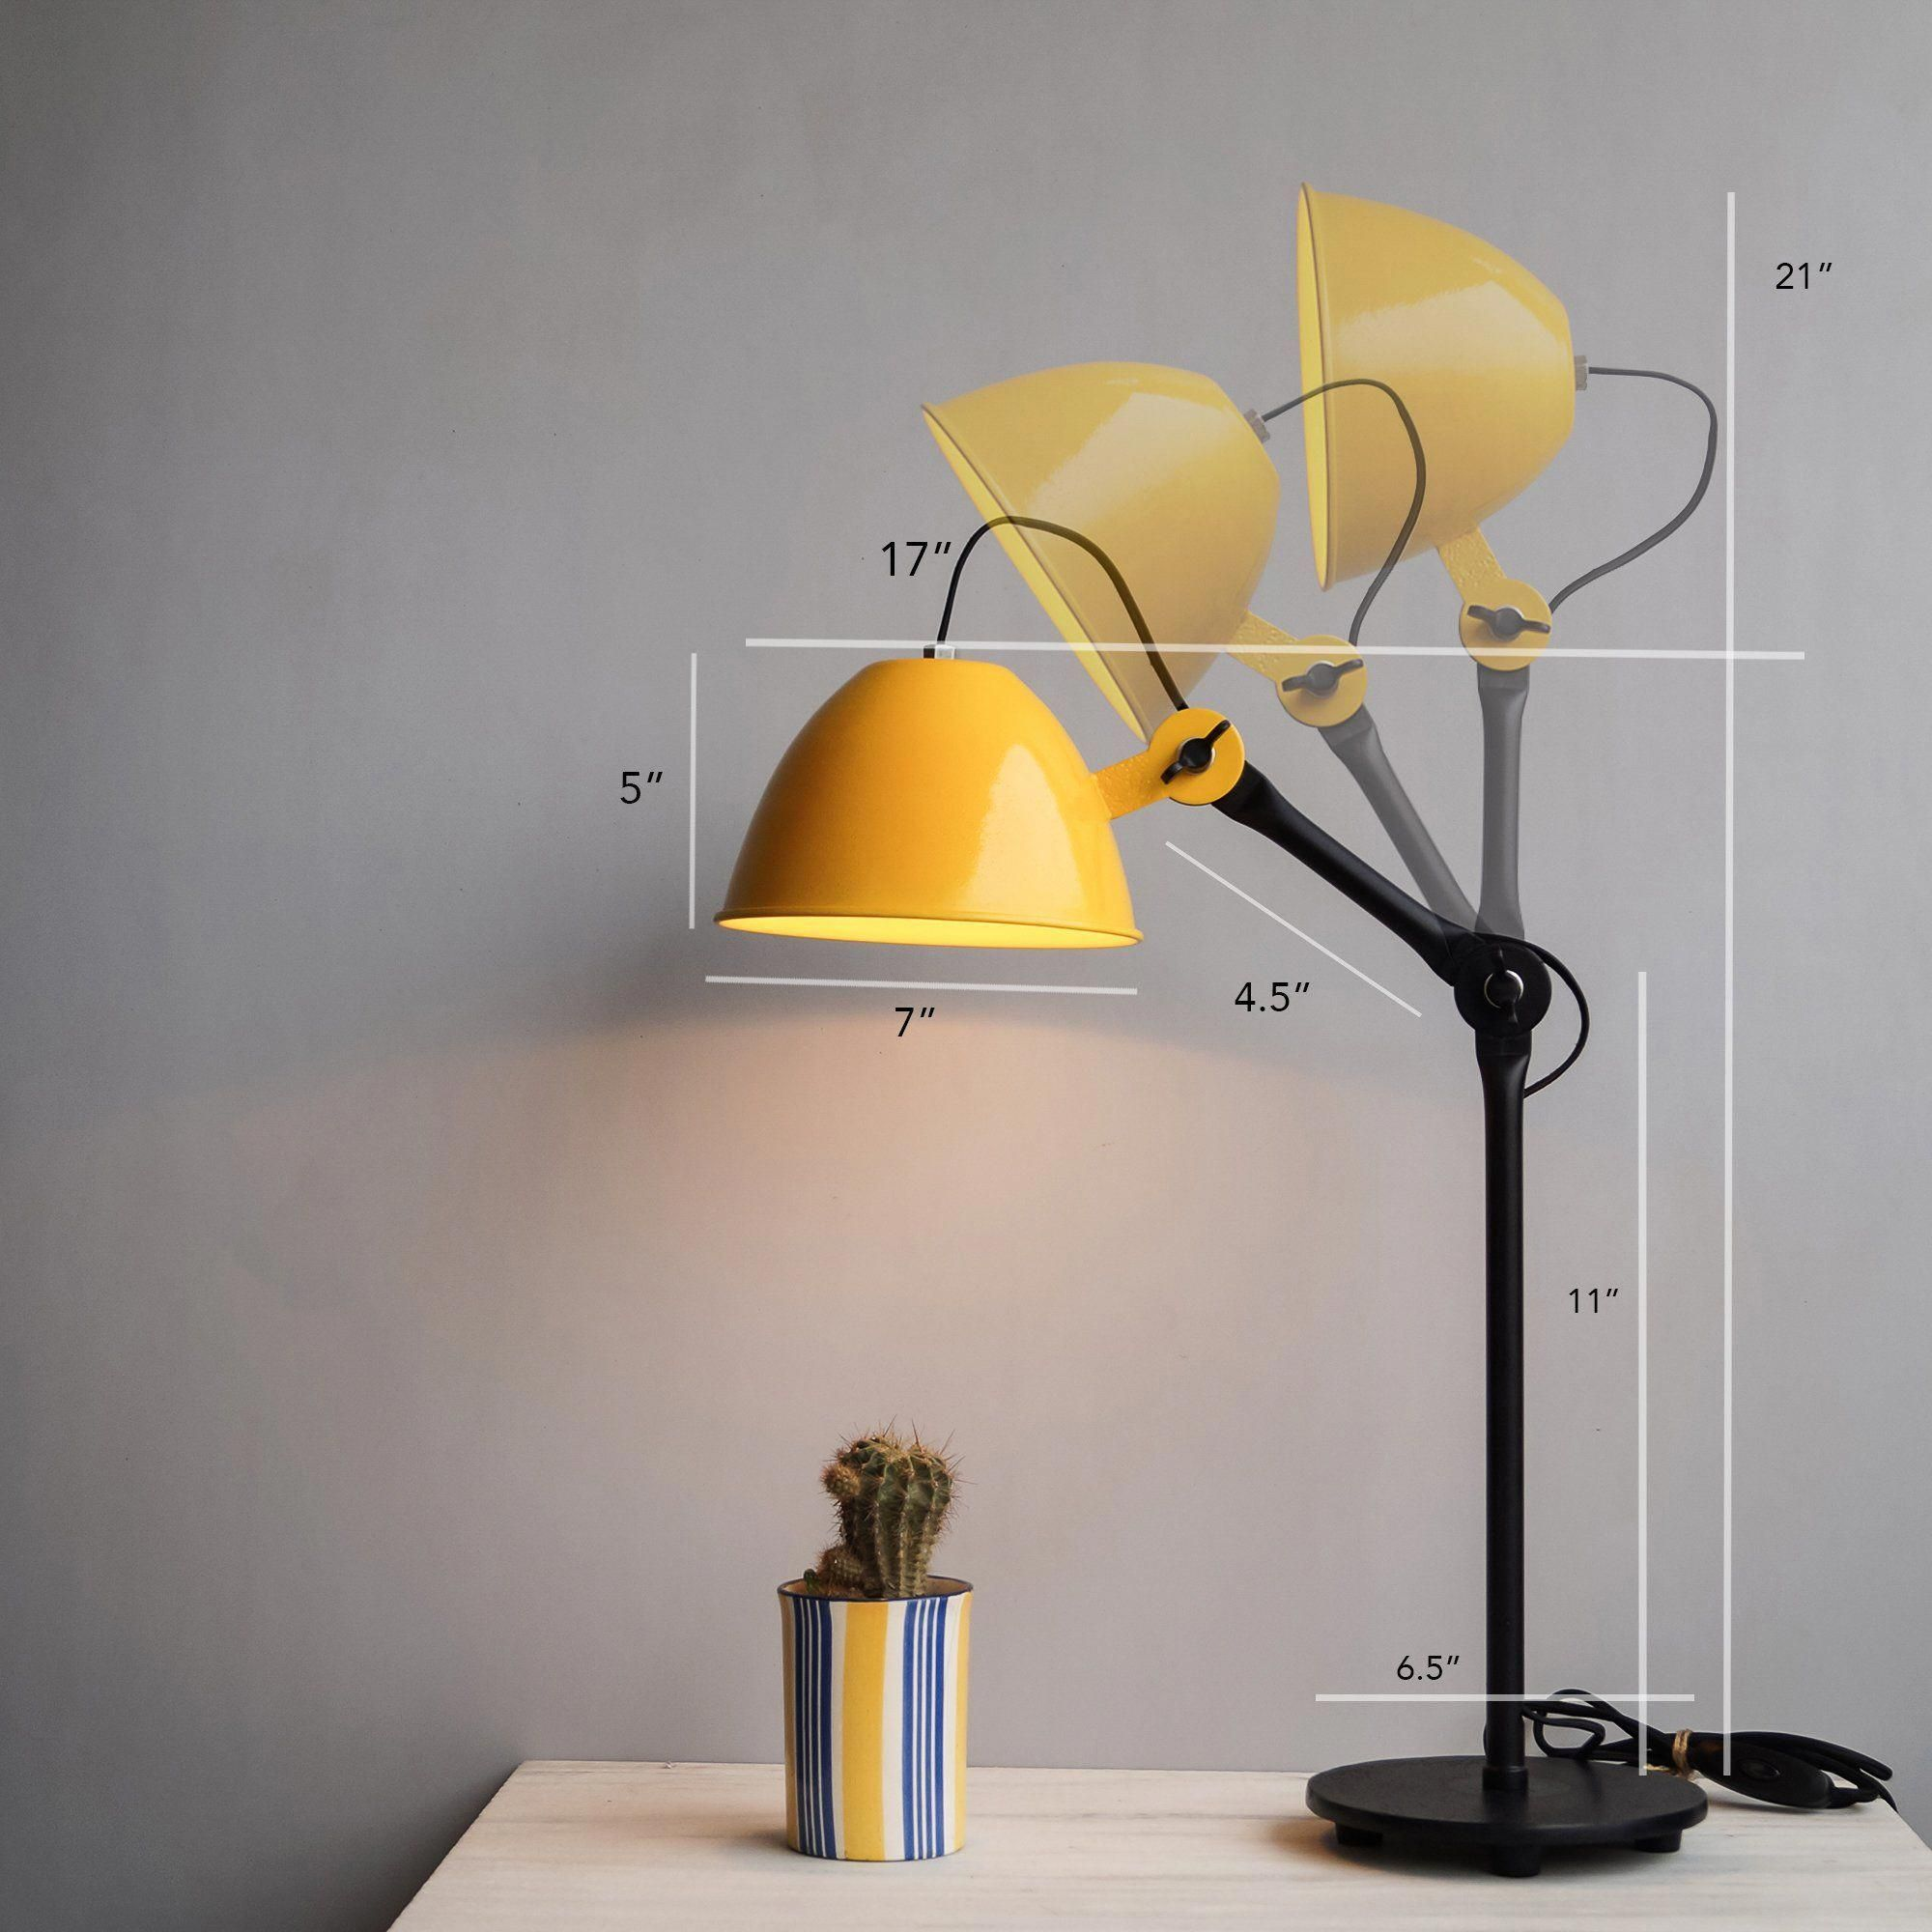 Yellow Flexible Cool Desk Light For Office Dimensions Of A Desk Light Desklamps Desk Lamp Desk Lamp Design Lamp